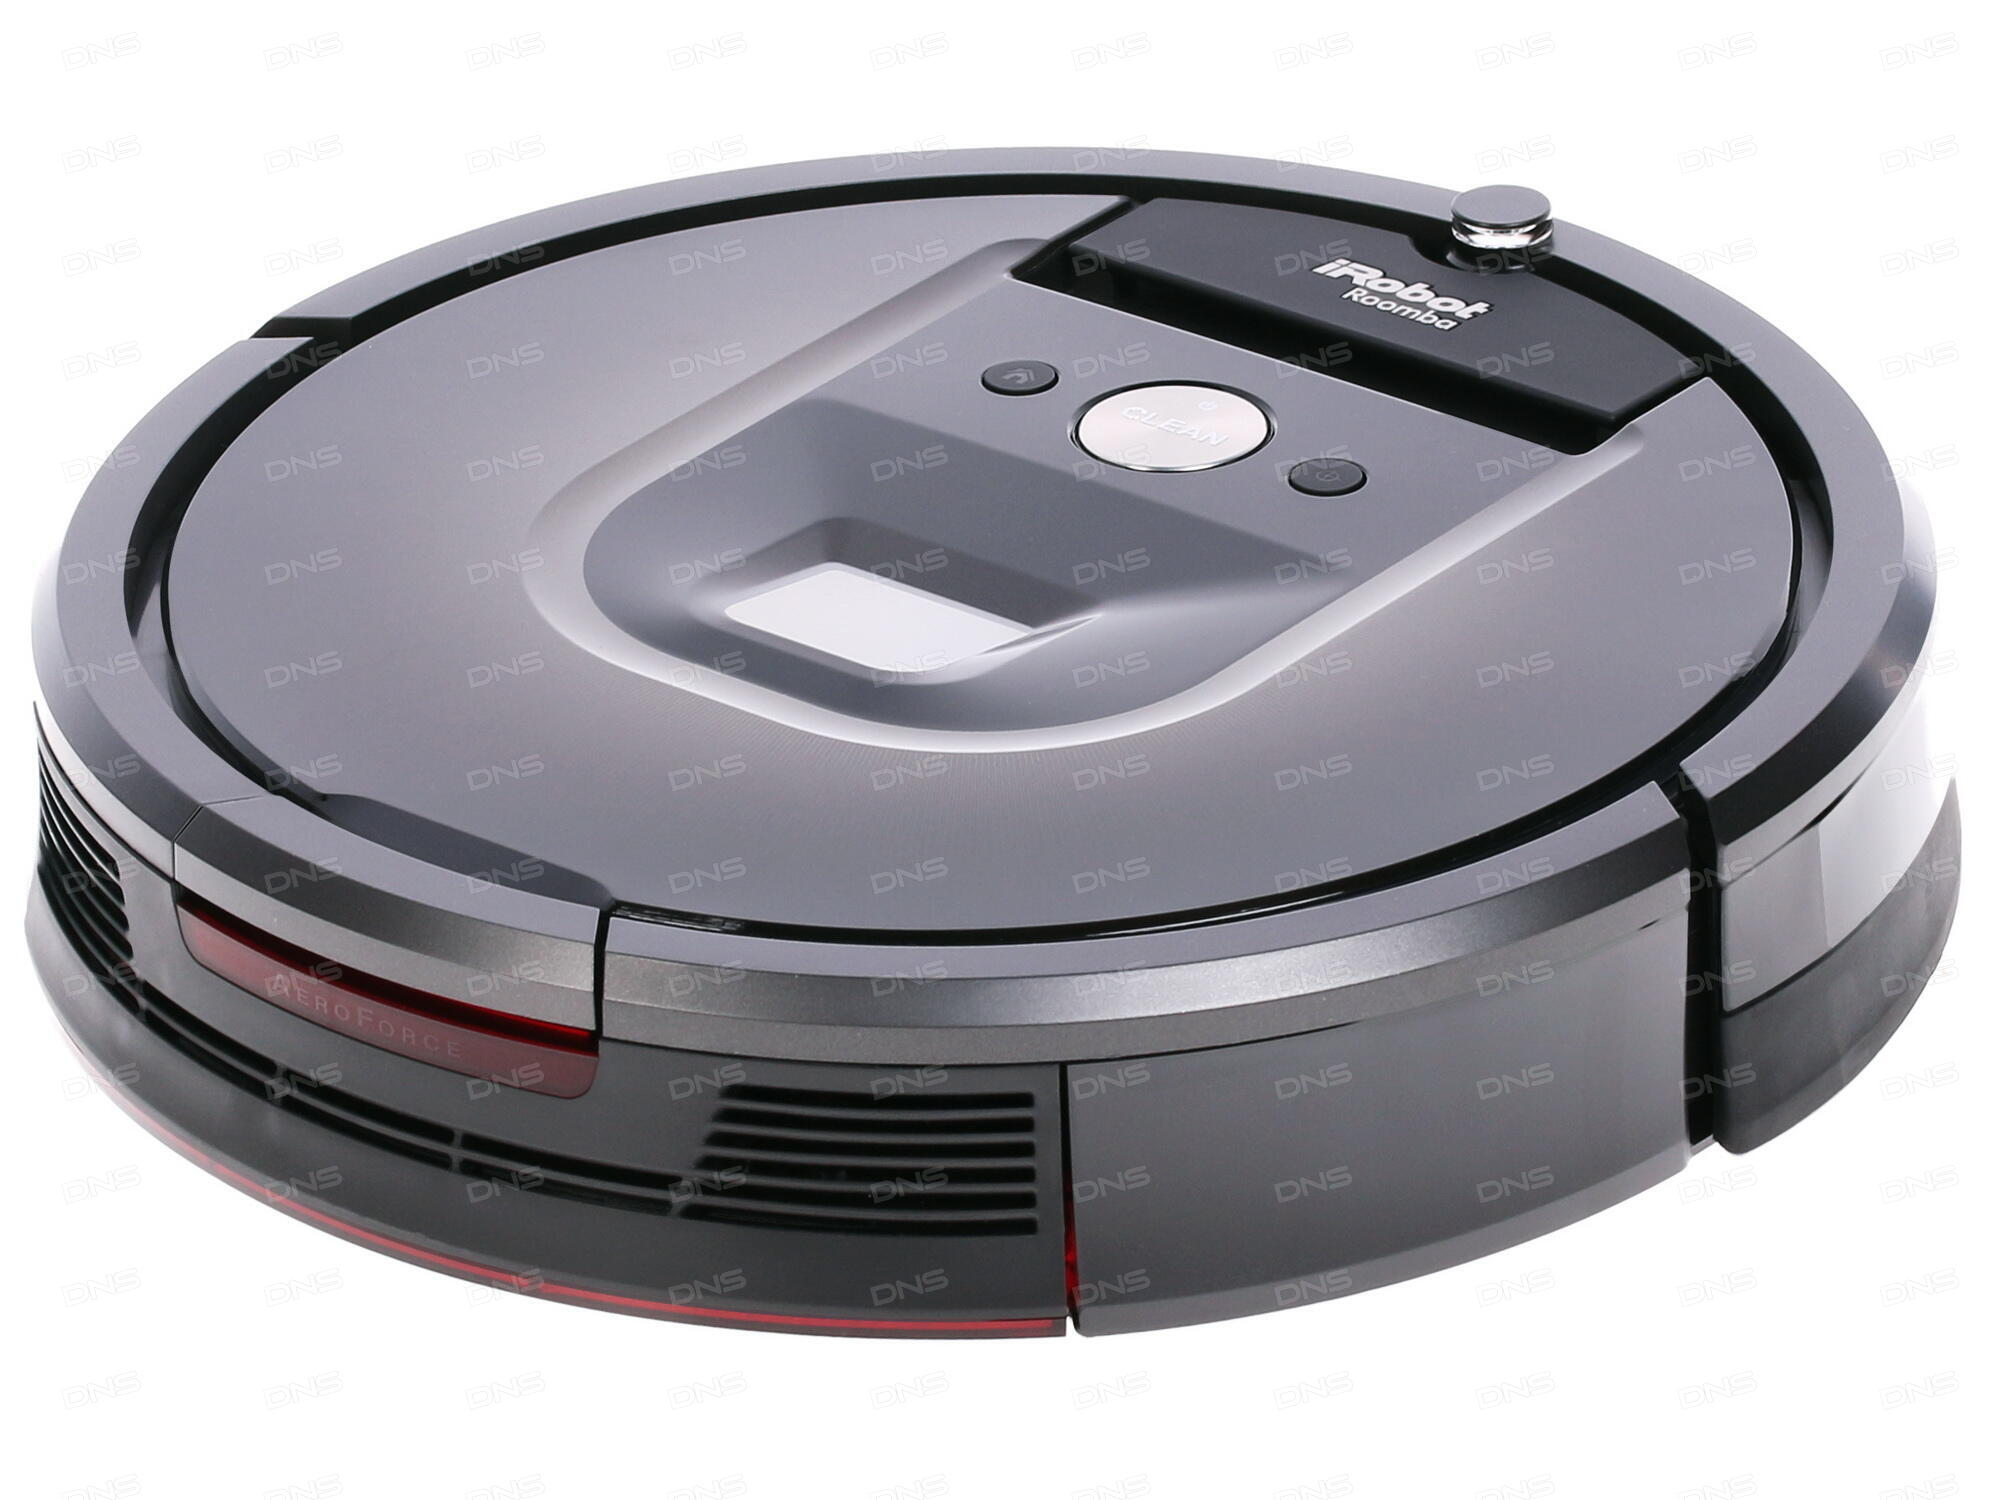 Пылесос-робот iRobot Roomba 960